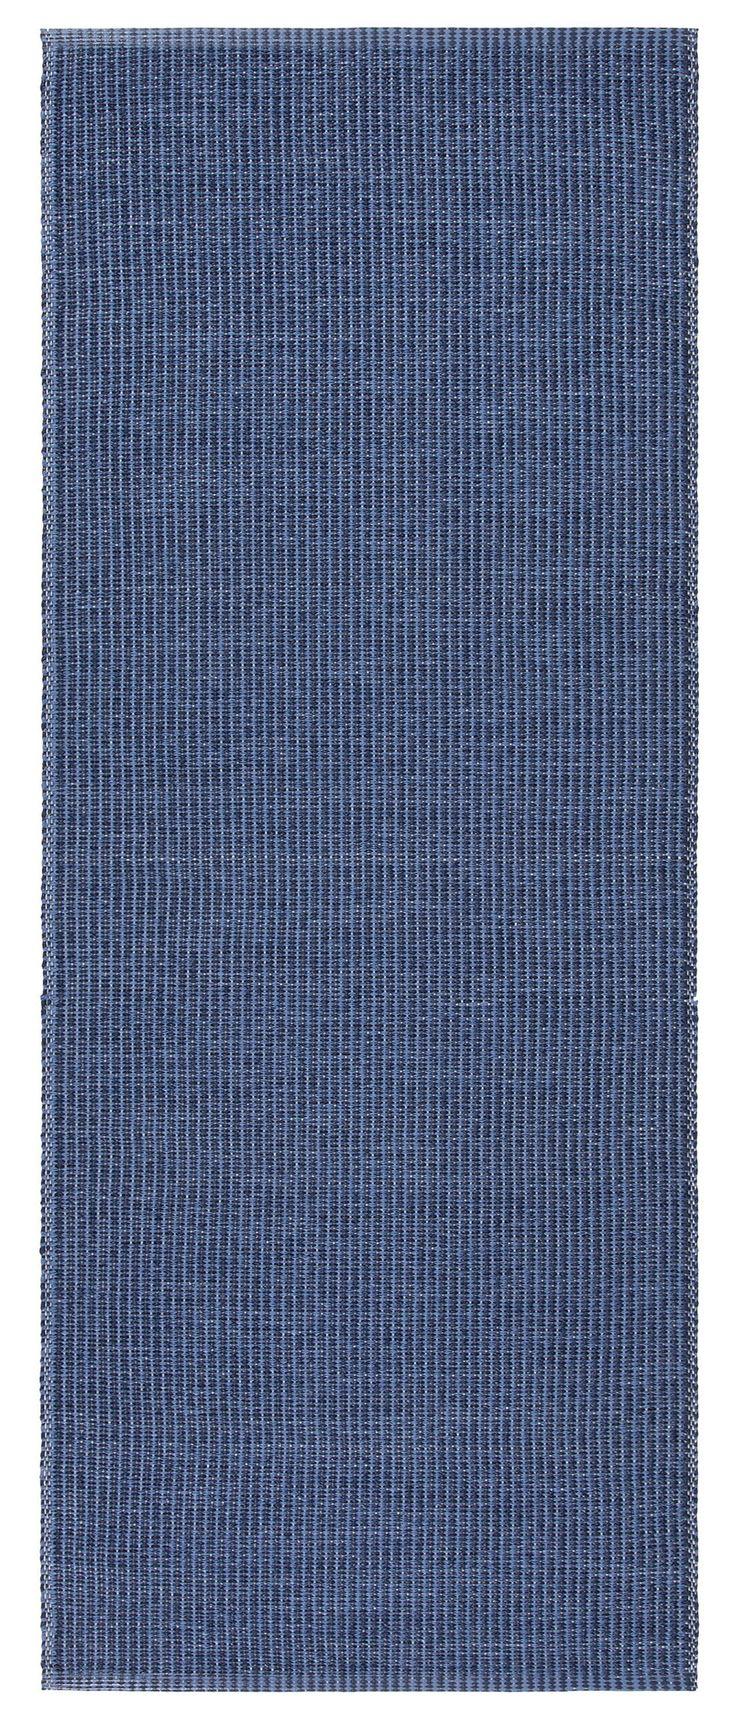 Urban Blue Handcrafted Rug | Wayfair UK